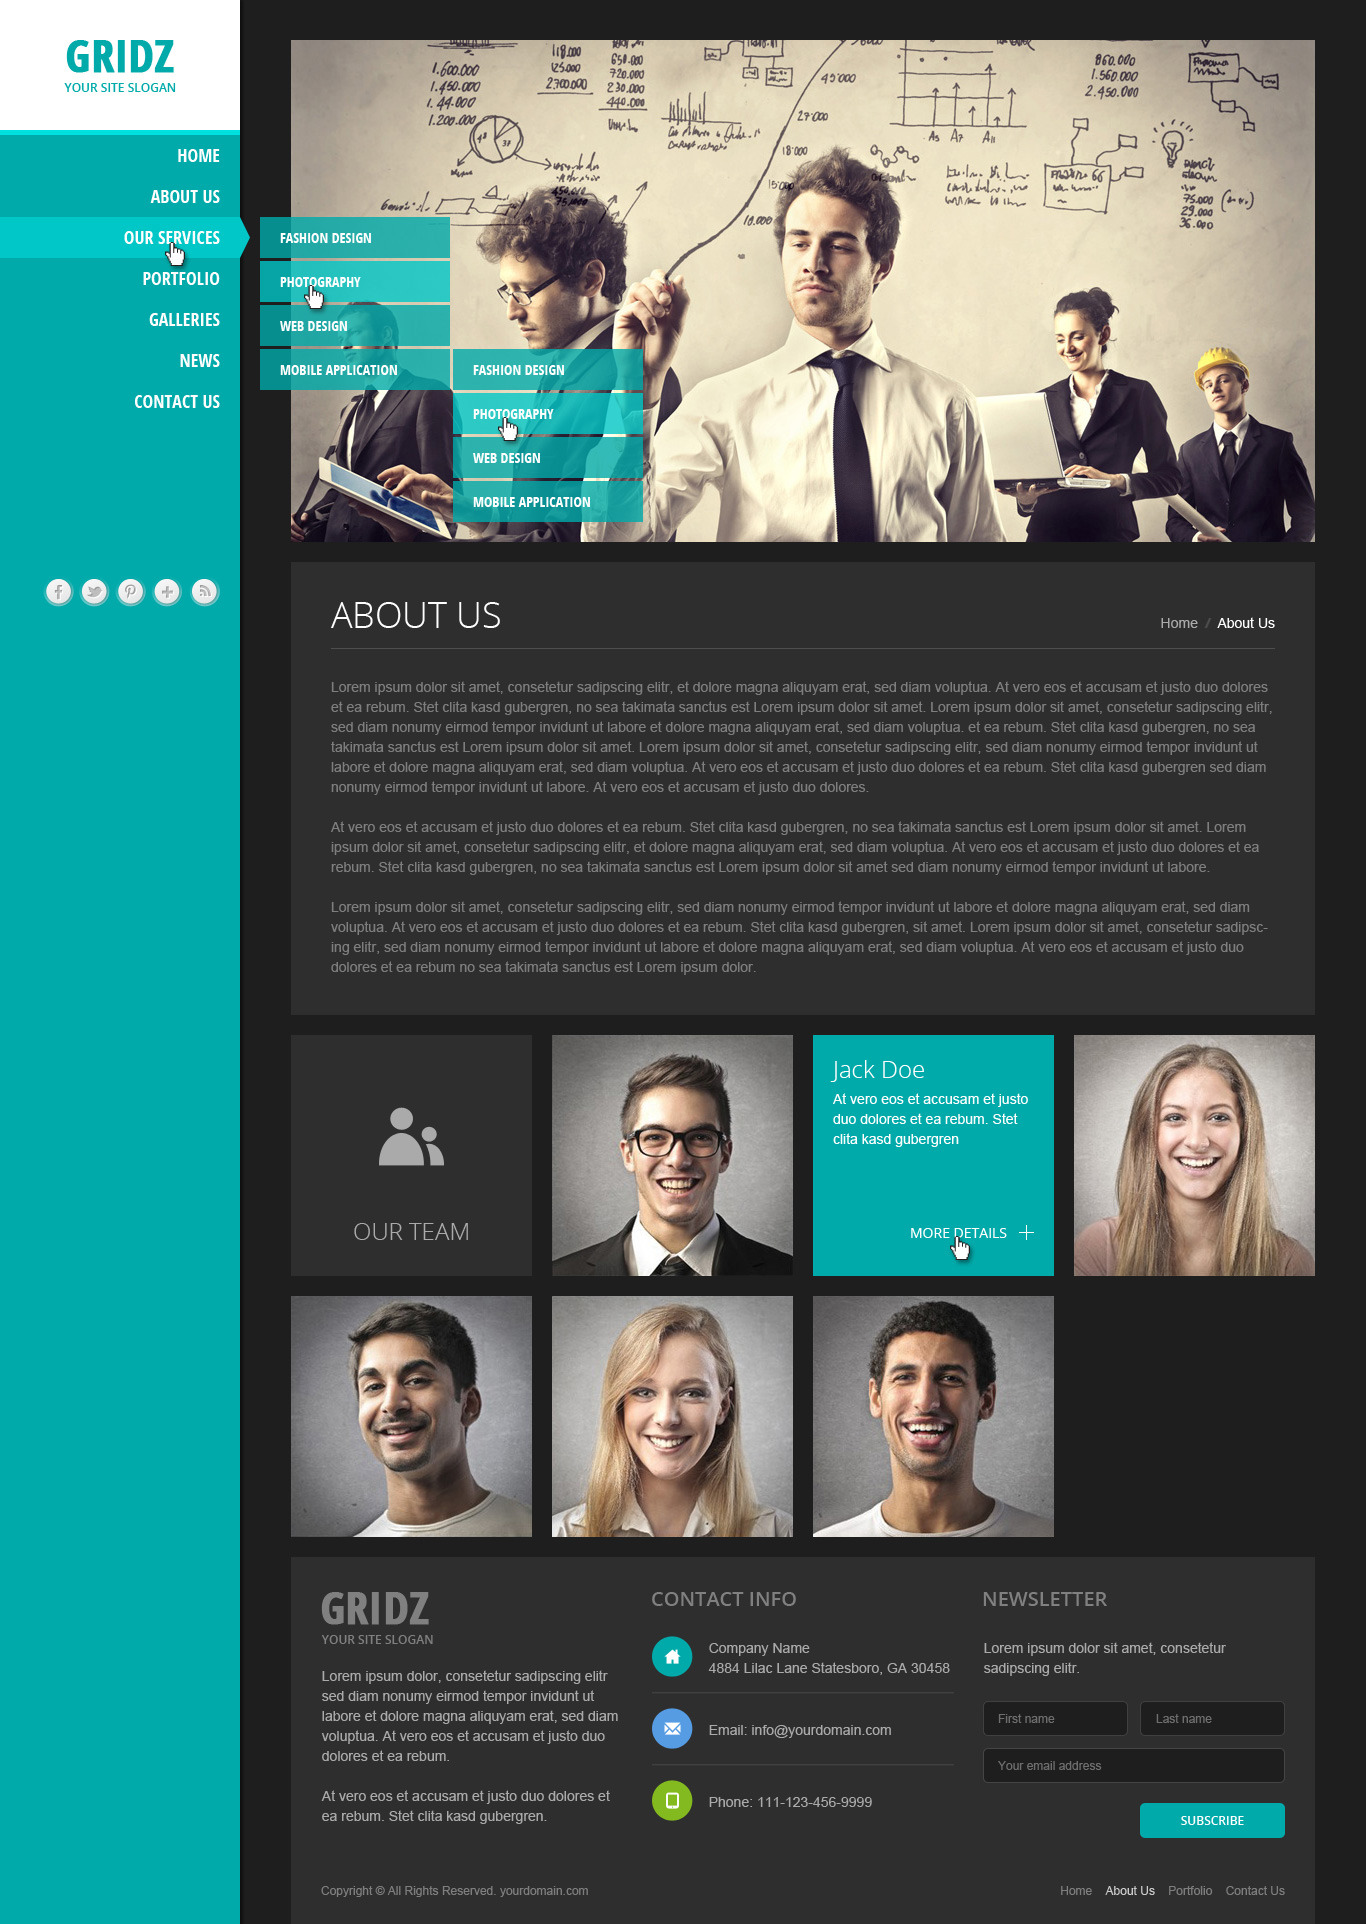 Gridz - Responsive HTML5 Template by pophonic   ThemeForest